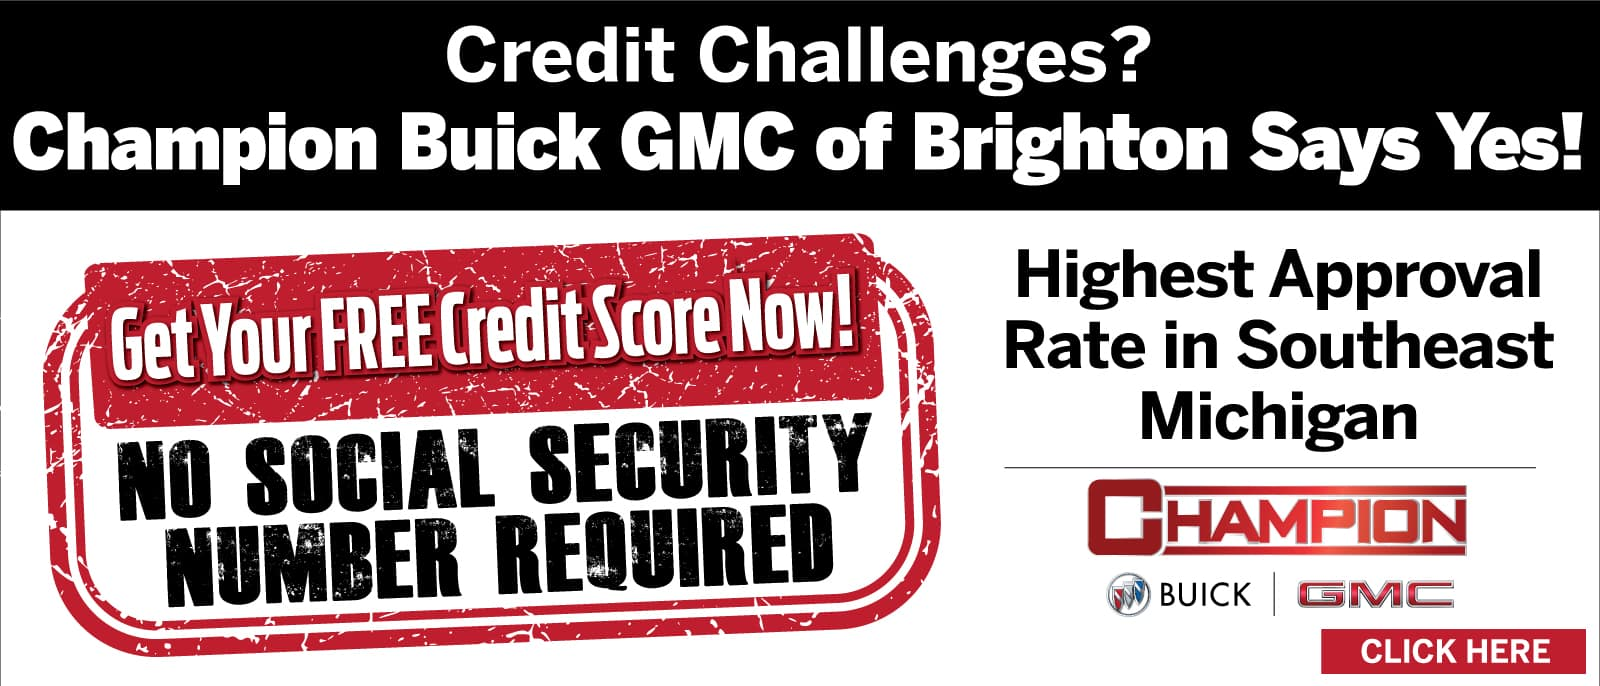 BuickGMCBrighton_ChallengedCredit_WEB